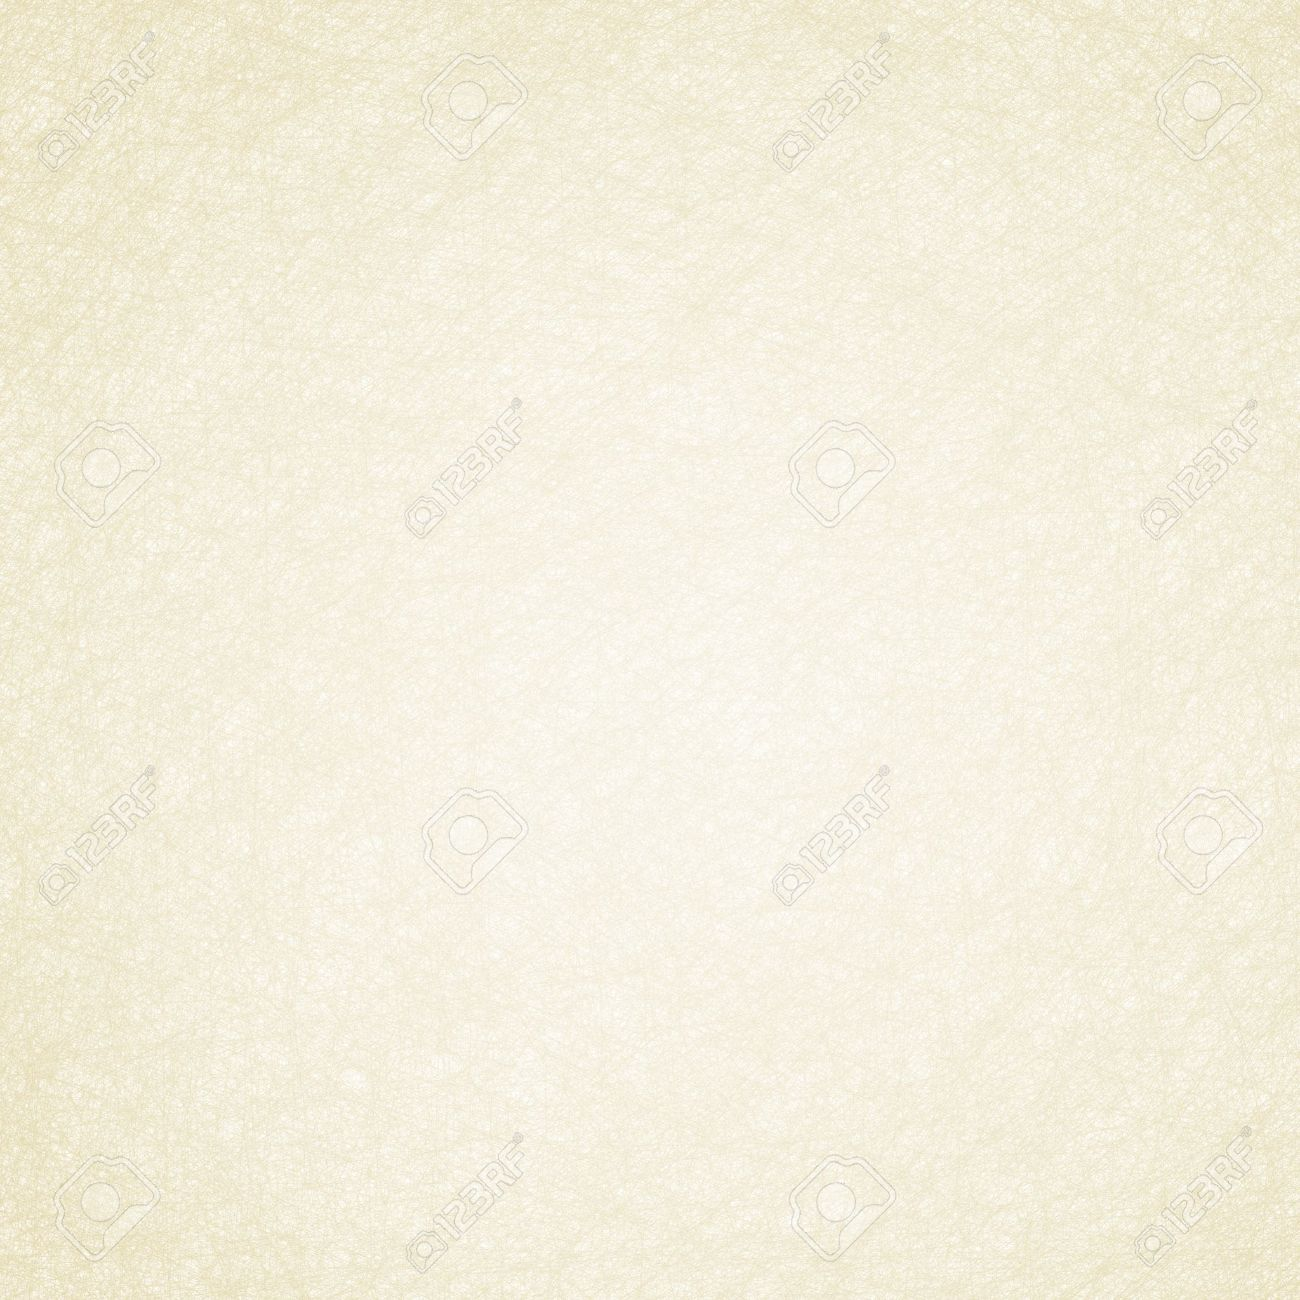 Abstract White Background Elegant Old Pale Vintage Grunge Background